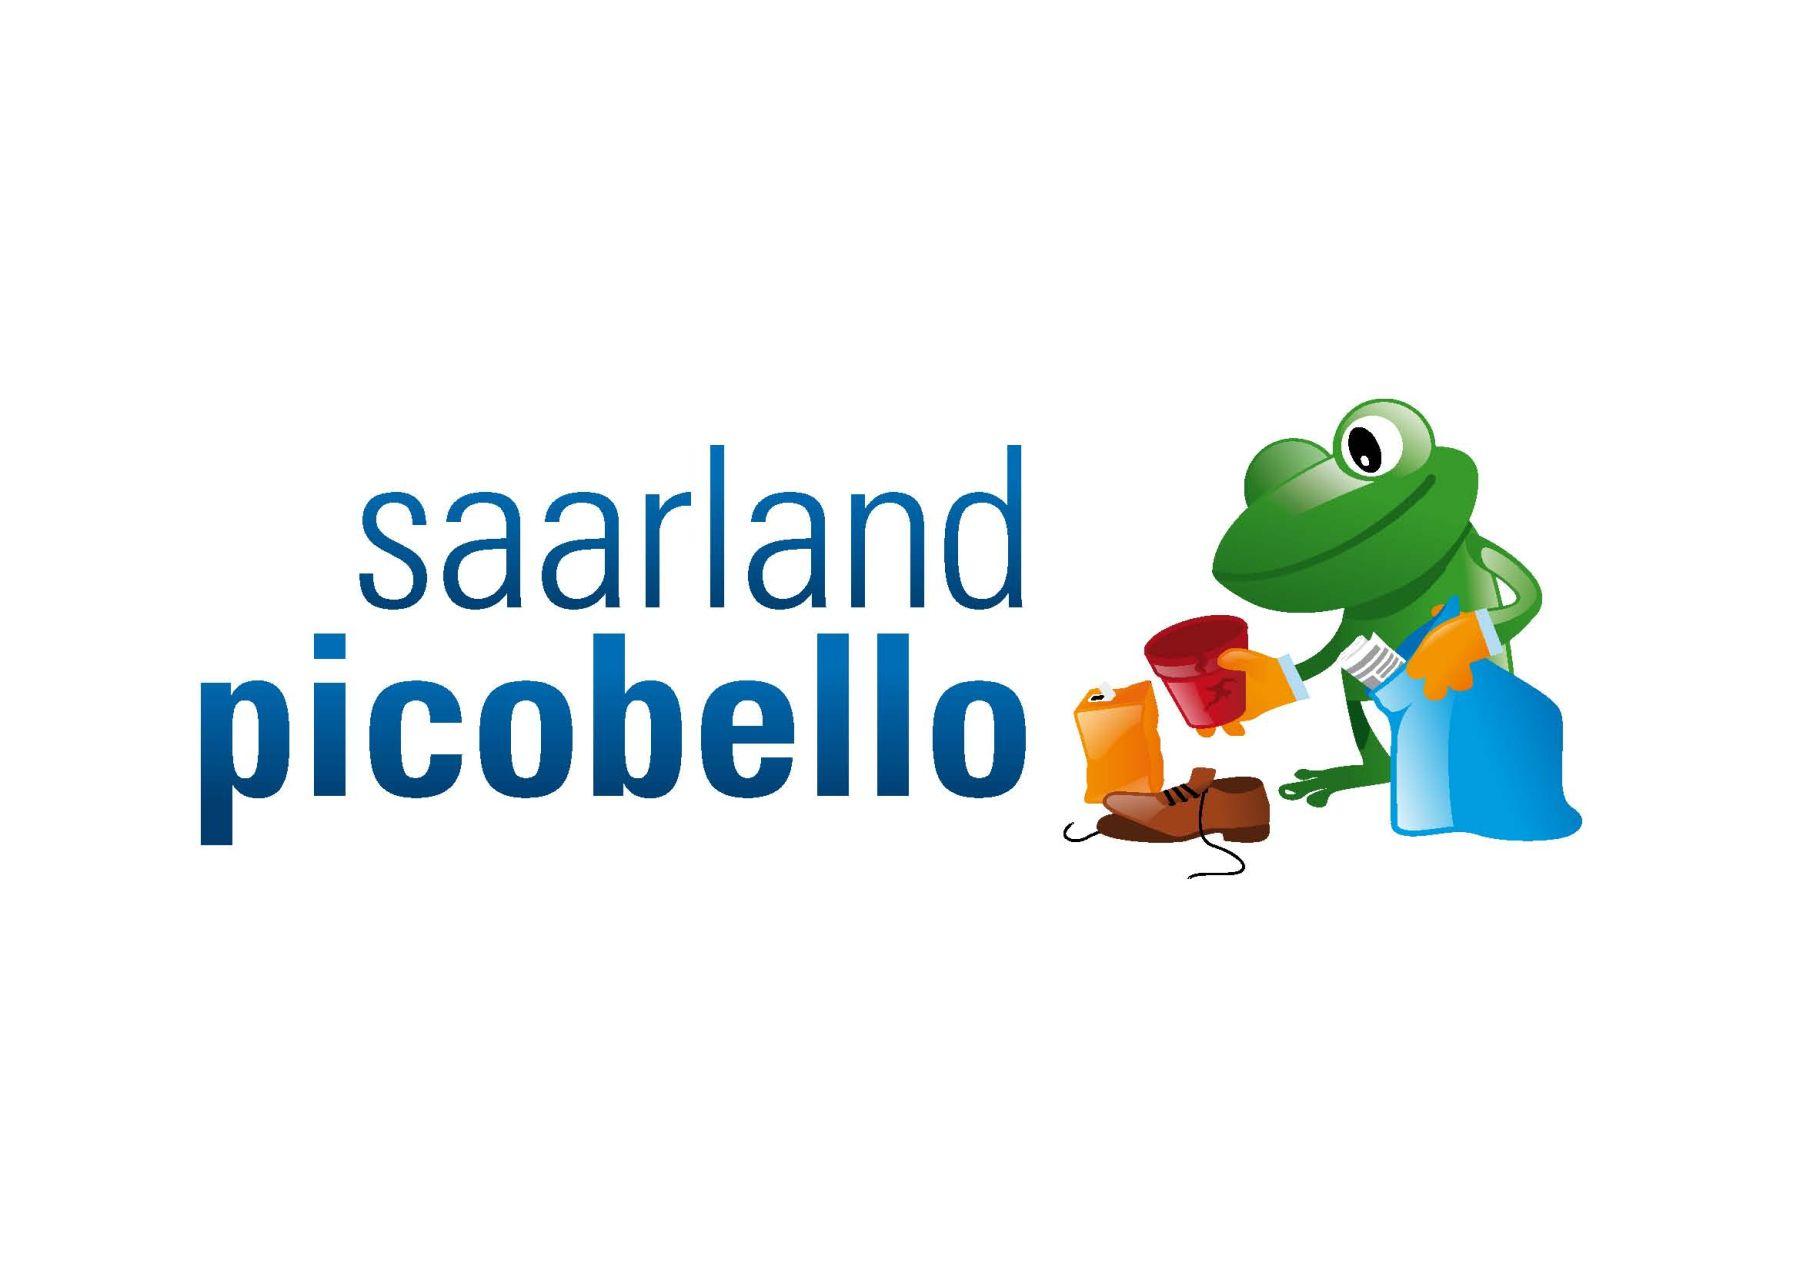 picobello Froschillustration mit Logo